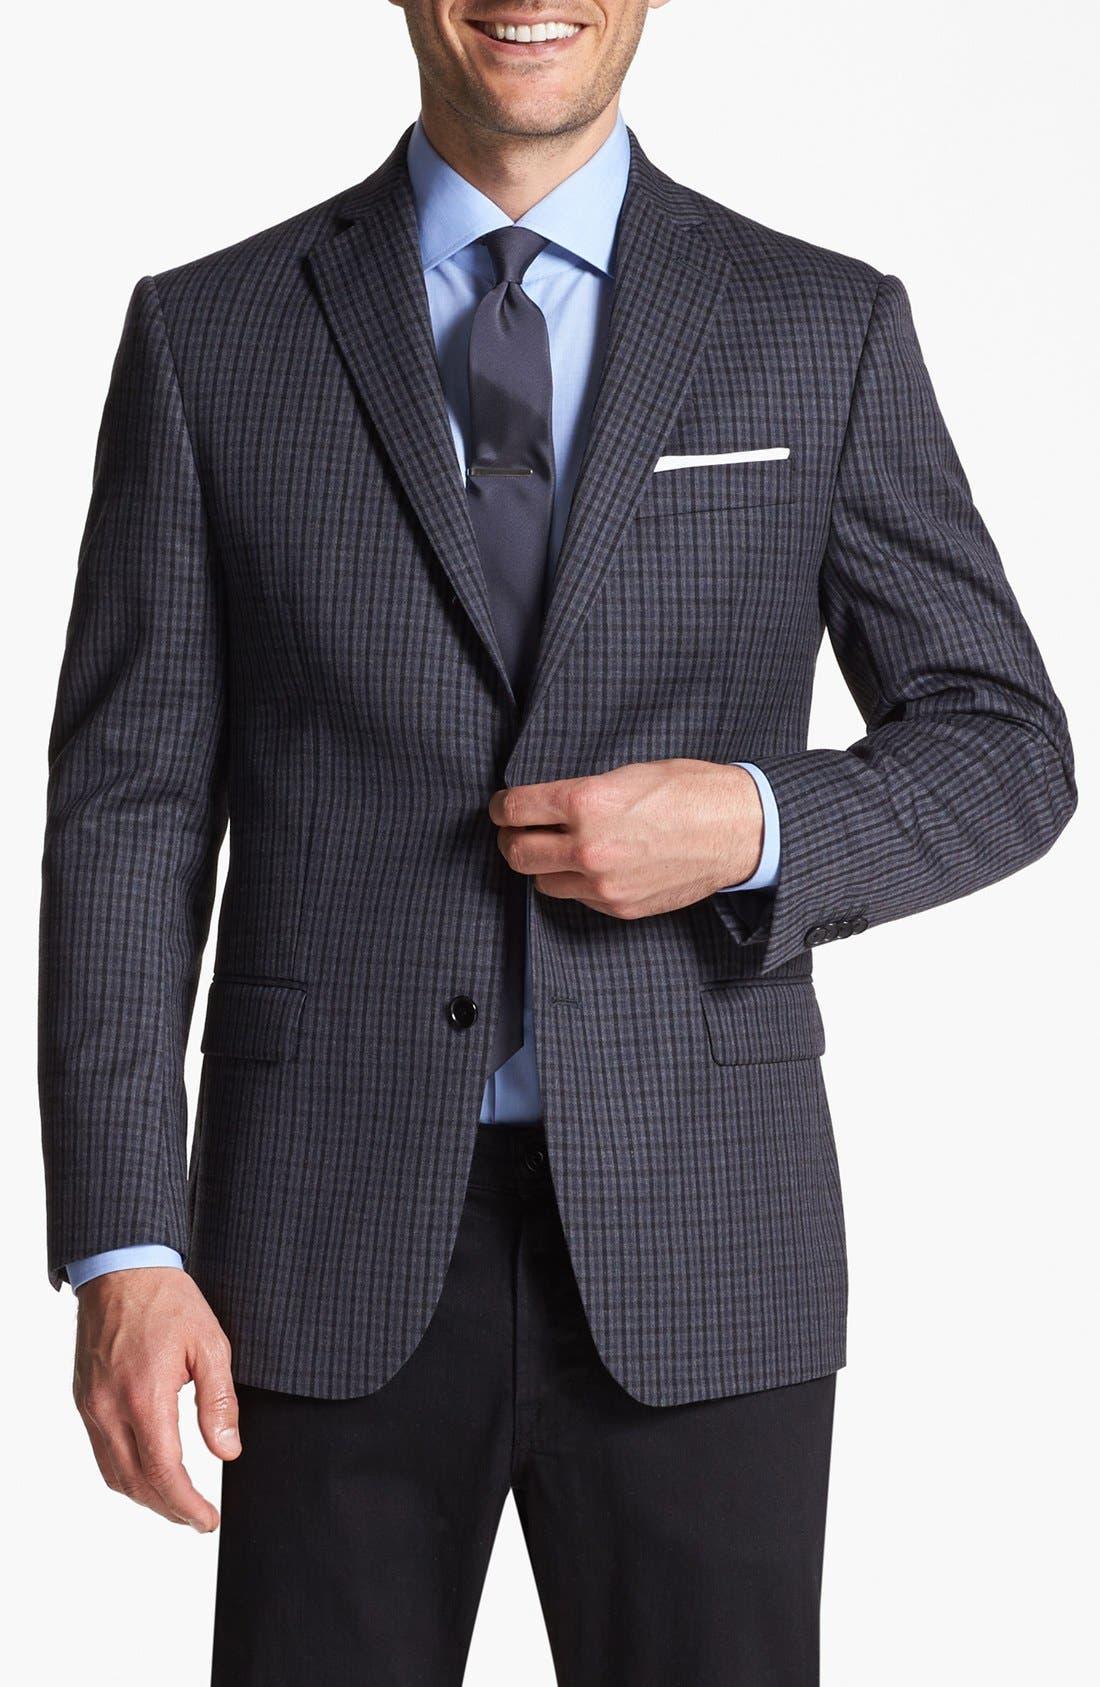 Main Image - Michael Kors Trim Fit Plaid Sportcoat